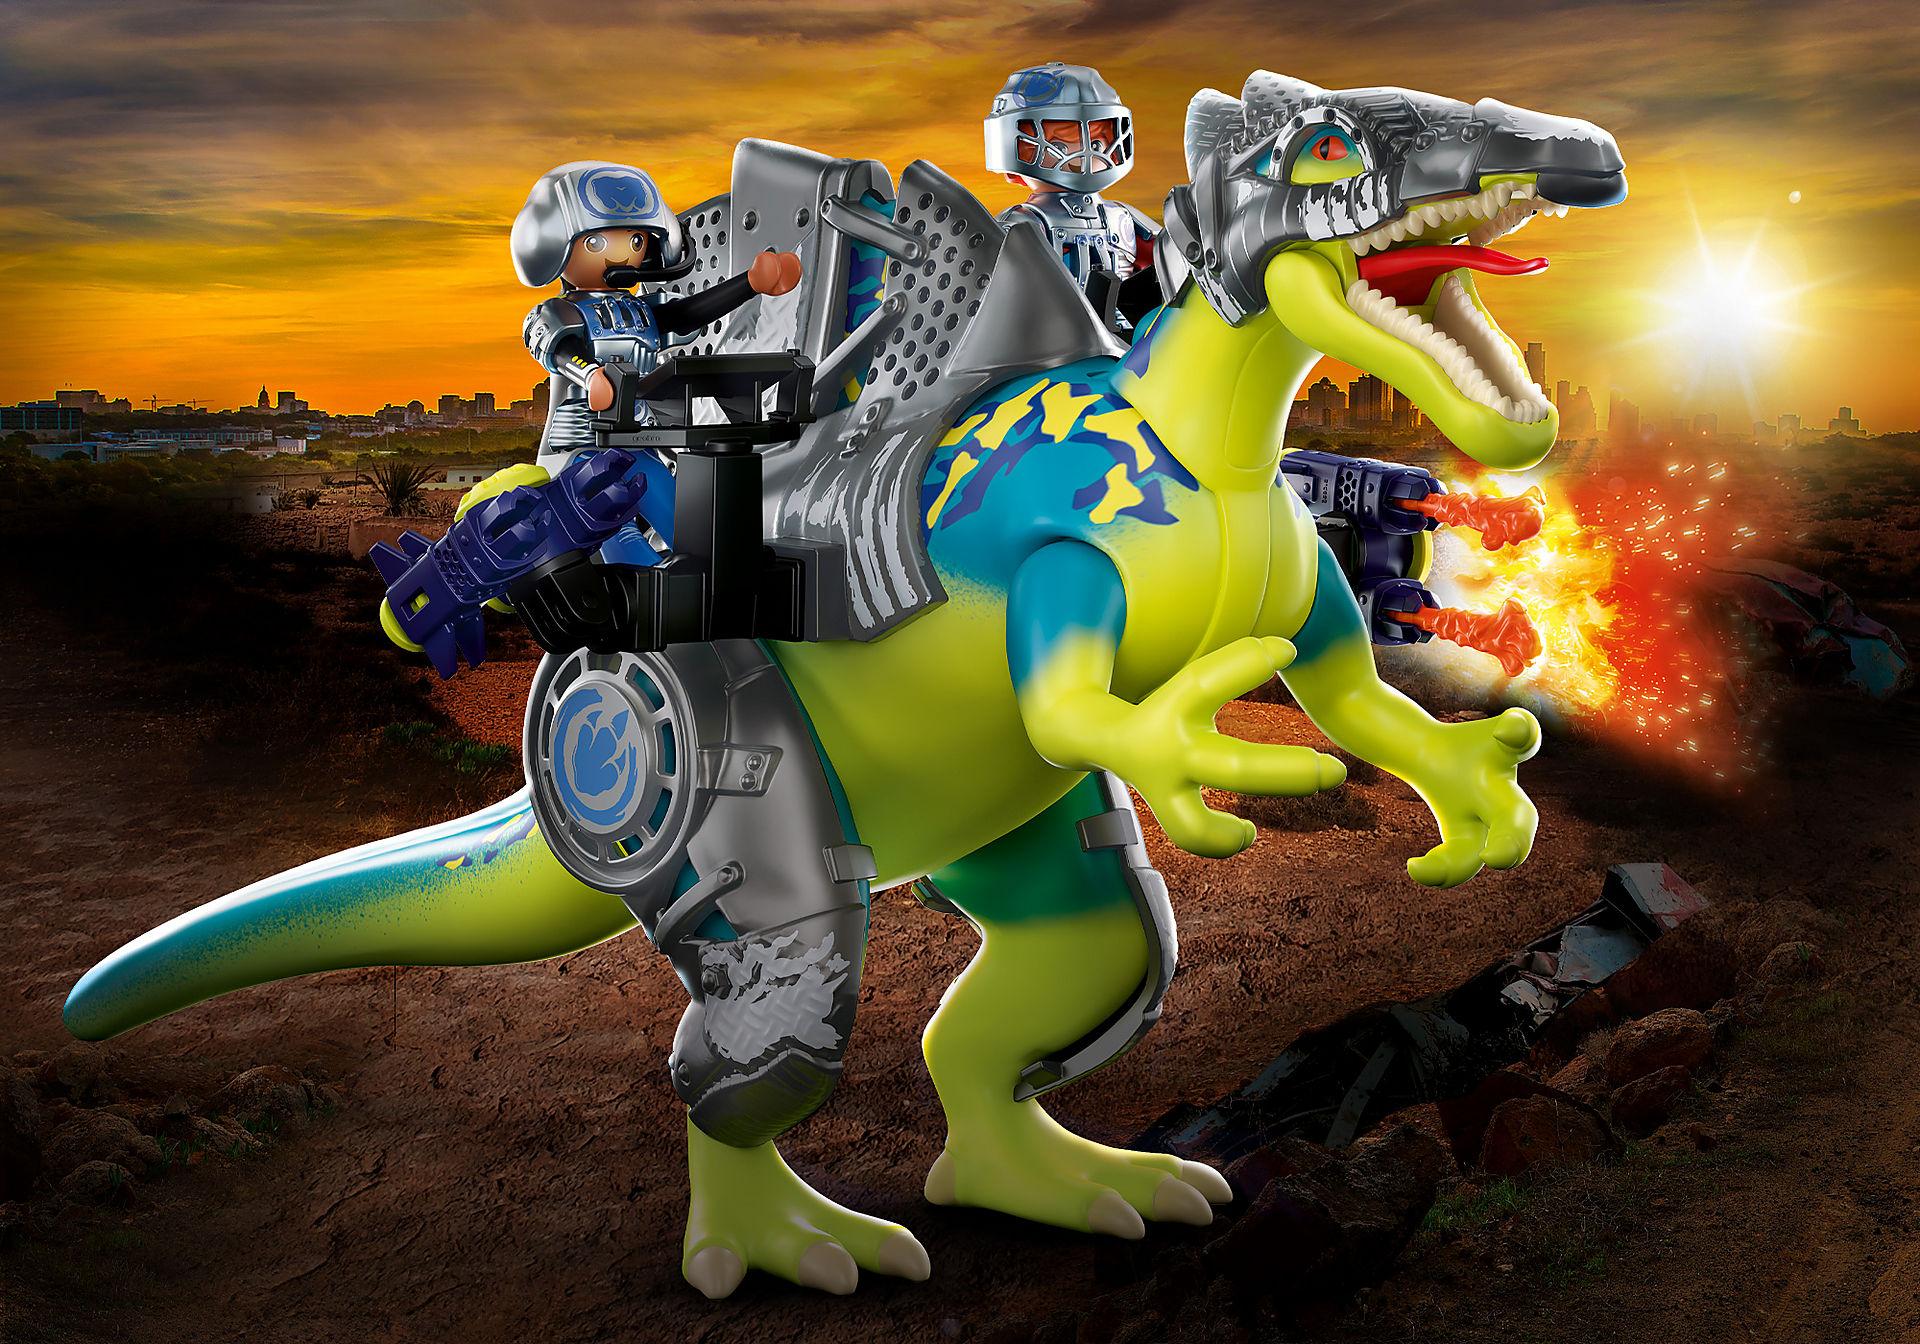 70625 Spinosaurus: Doppelte Verteidigungs-Power zoom image1